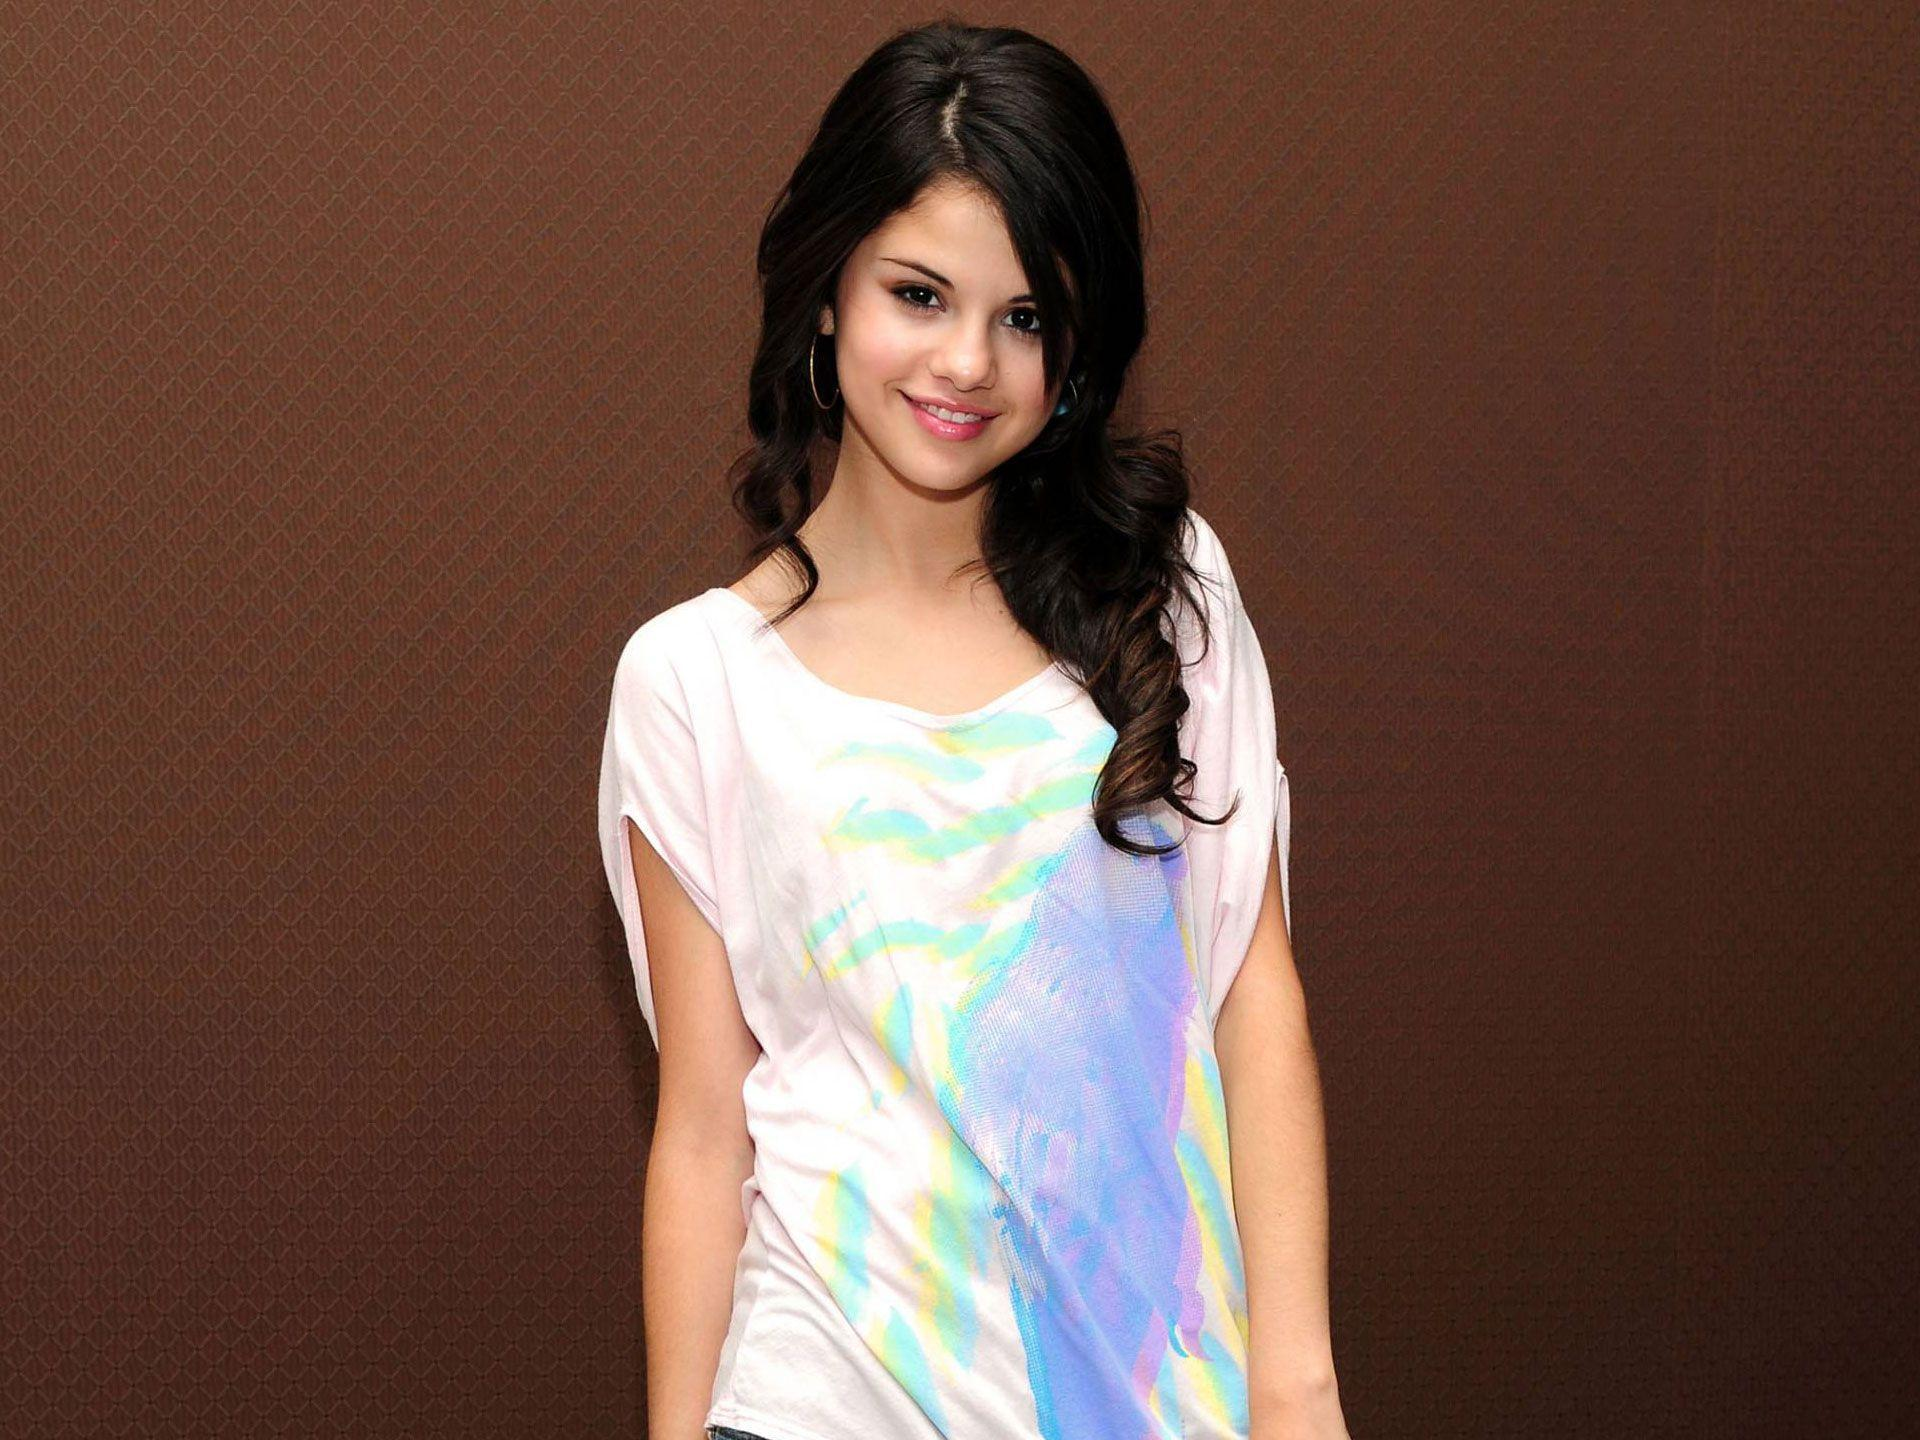 Wallpaper Selena Gomez Hd Celebrities 7259: Selena Gomez HD Wallpapers